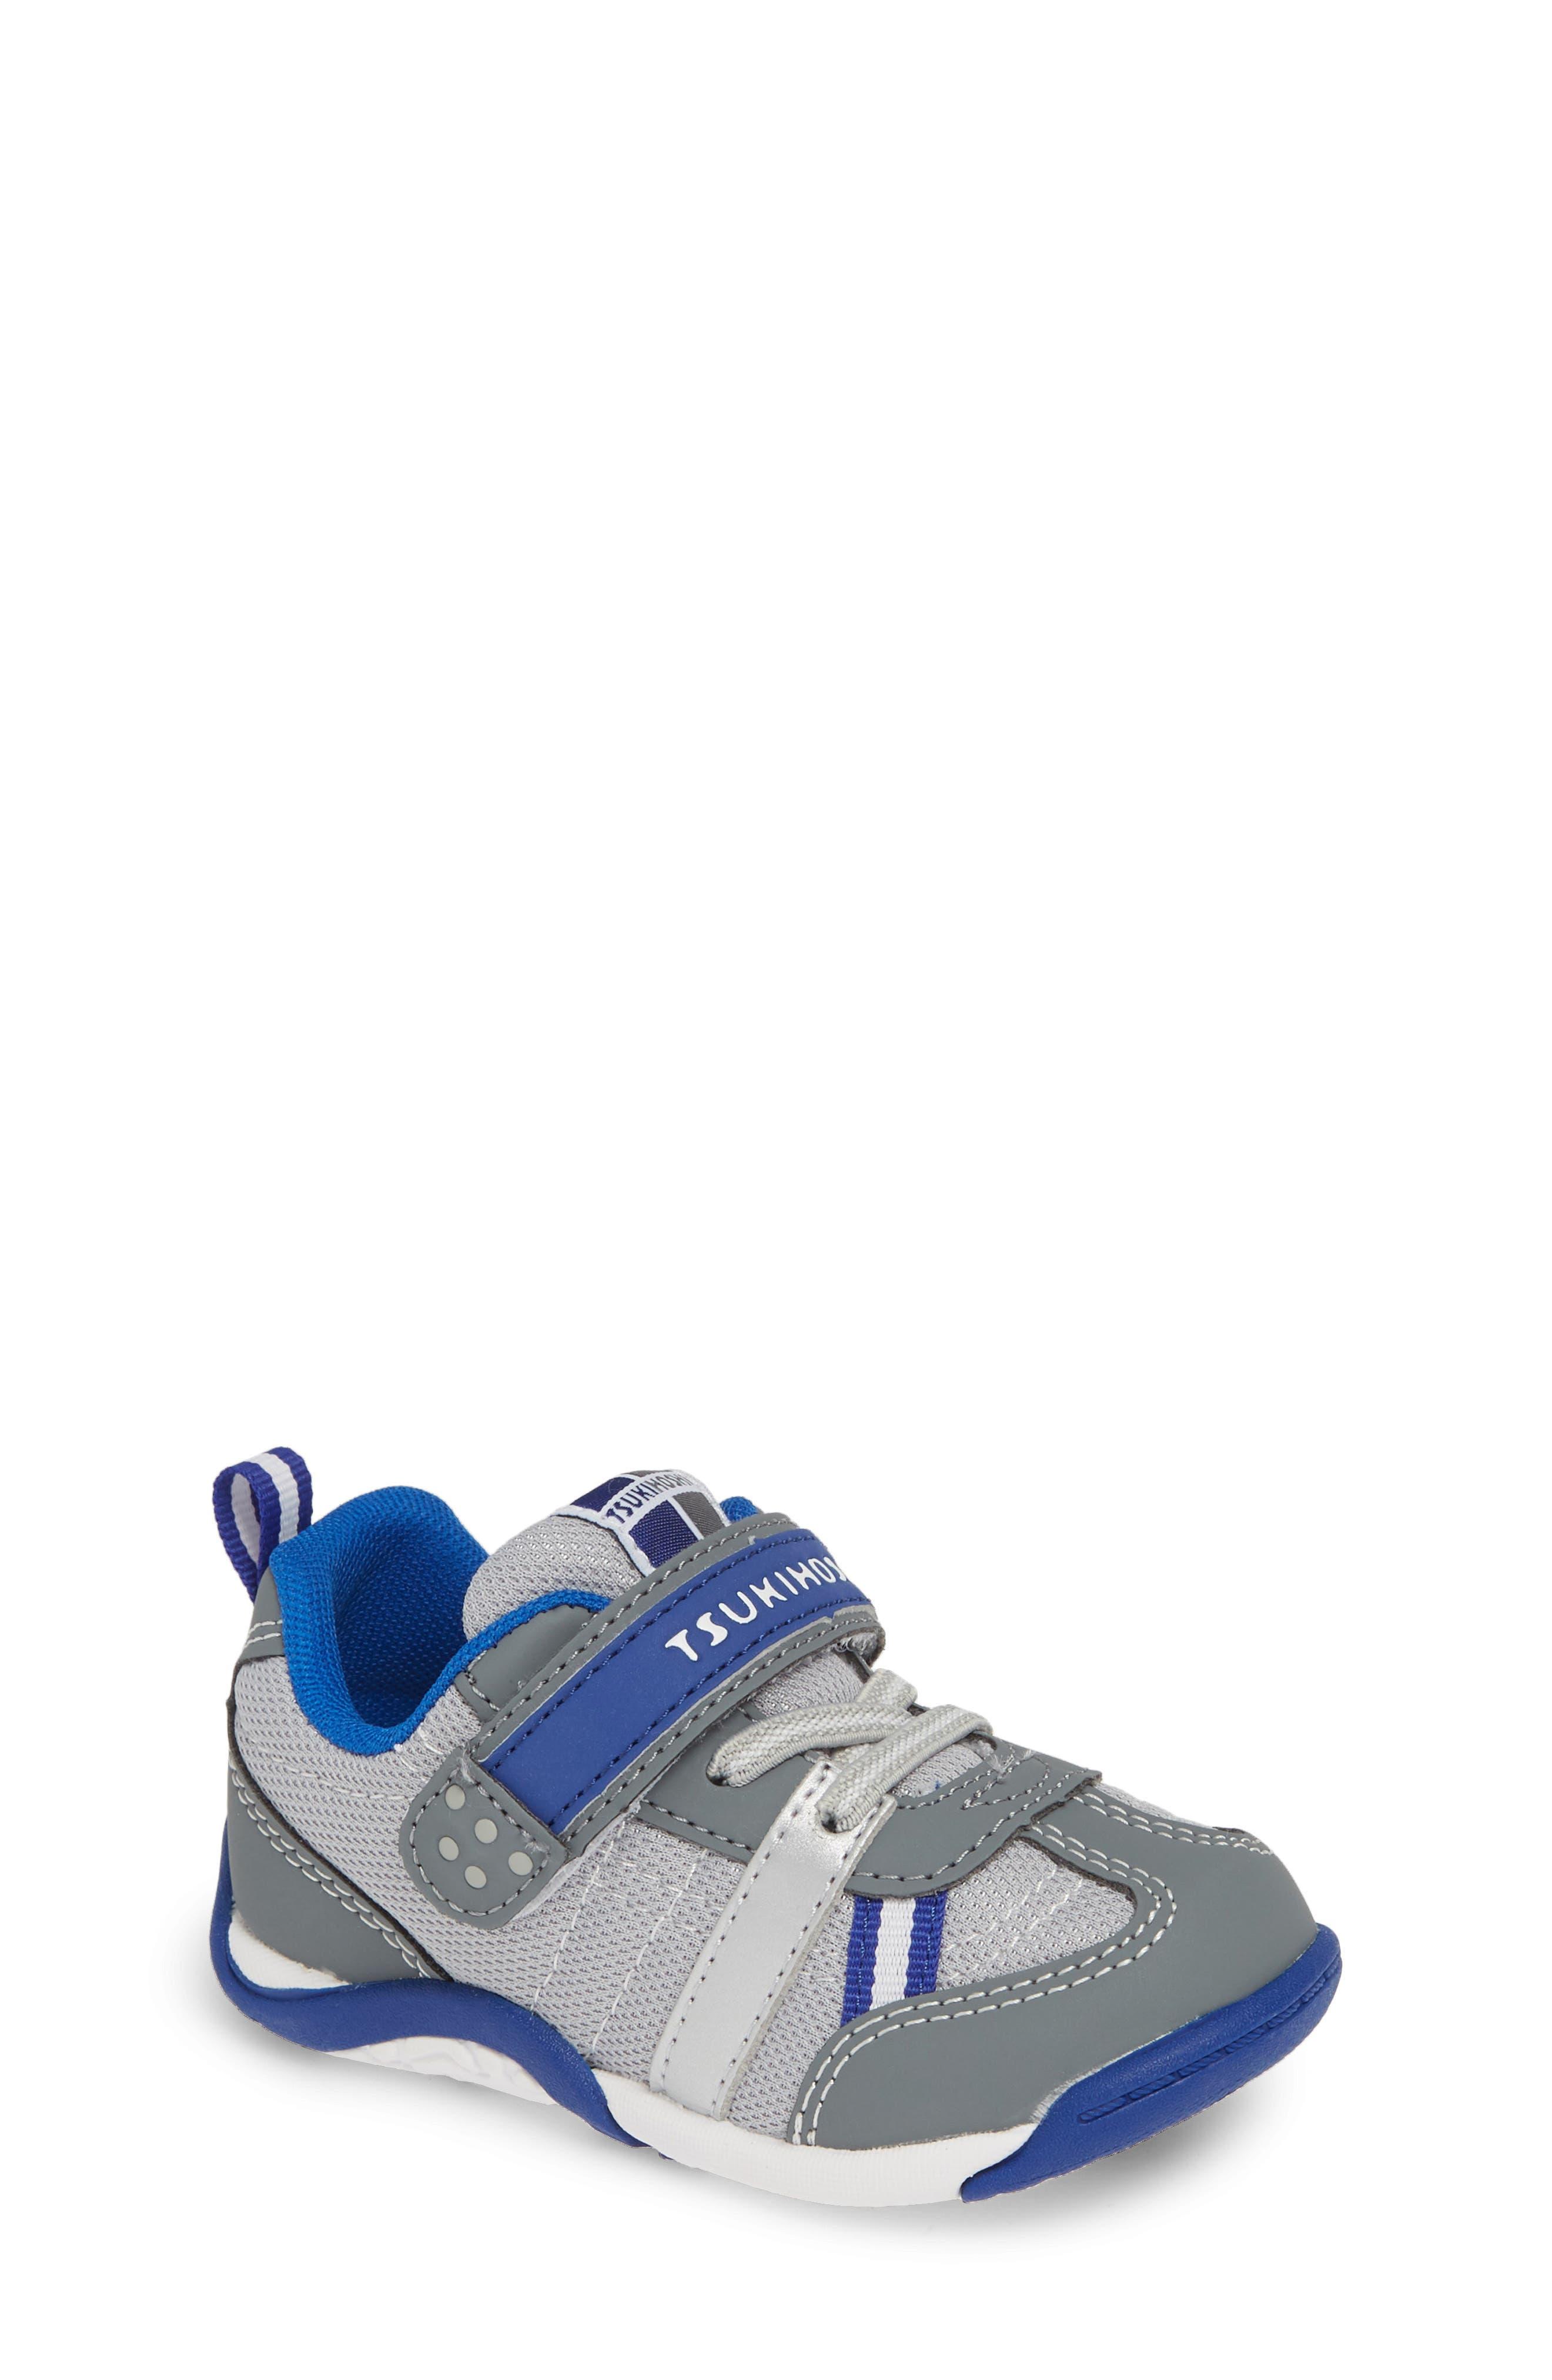 TSUKIHOSHI, Kaz Washable Sneaker, Main thumbnail 1, color, GRAY/ ROYAL